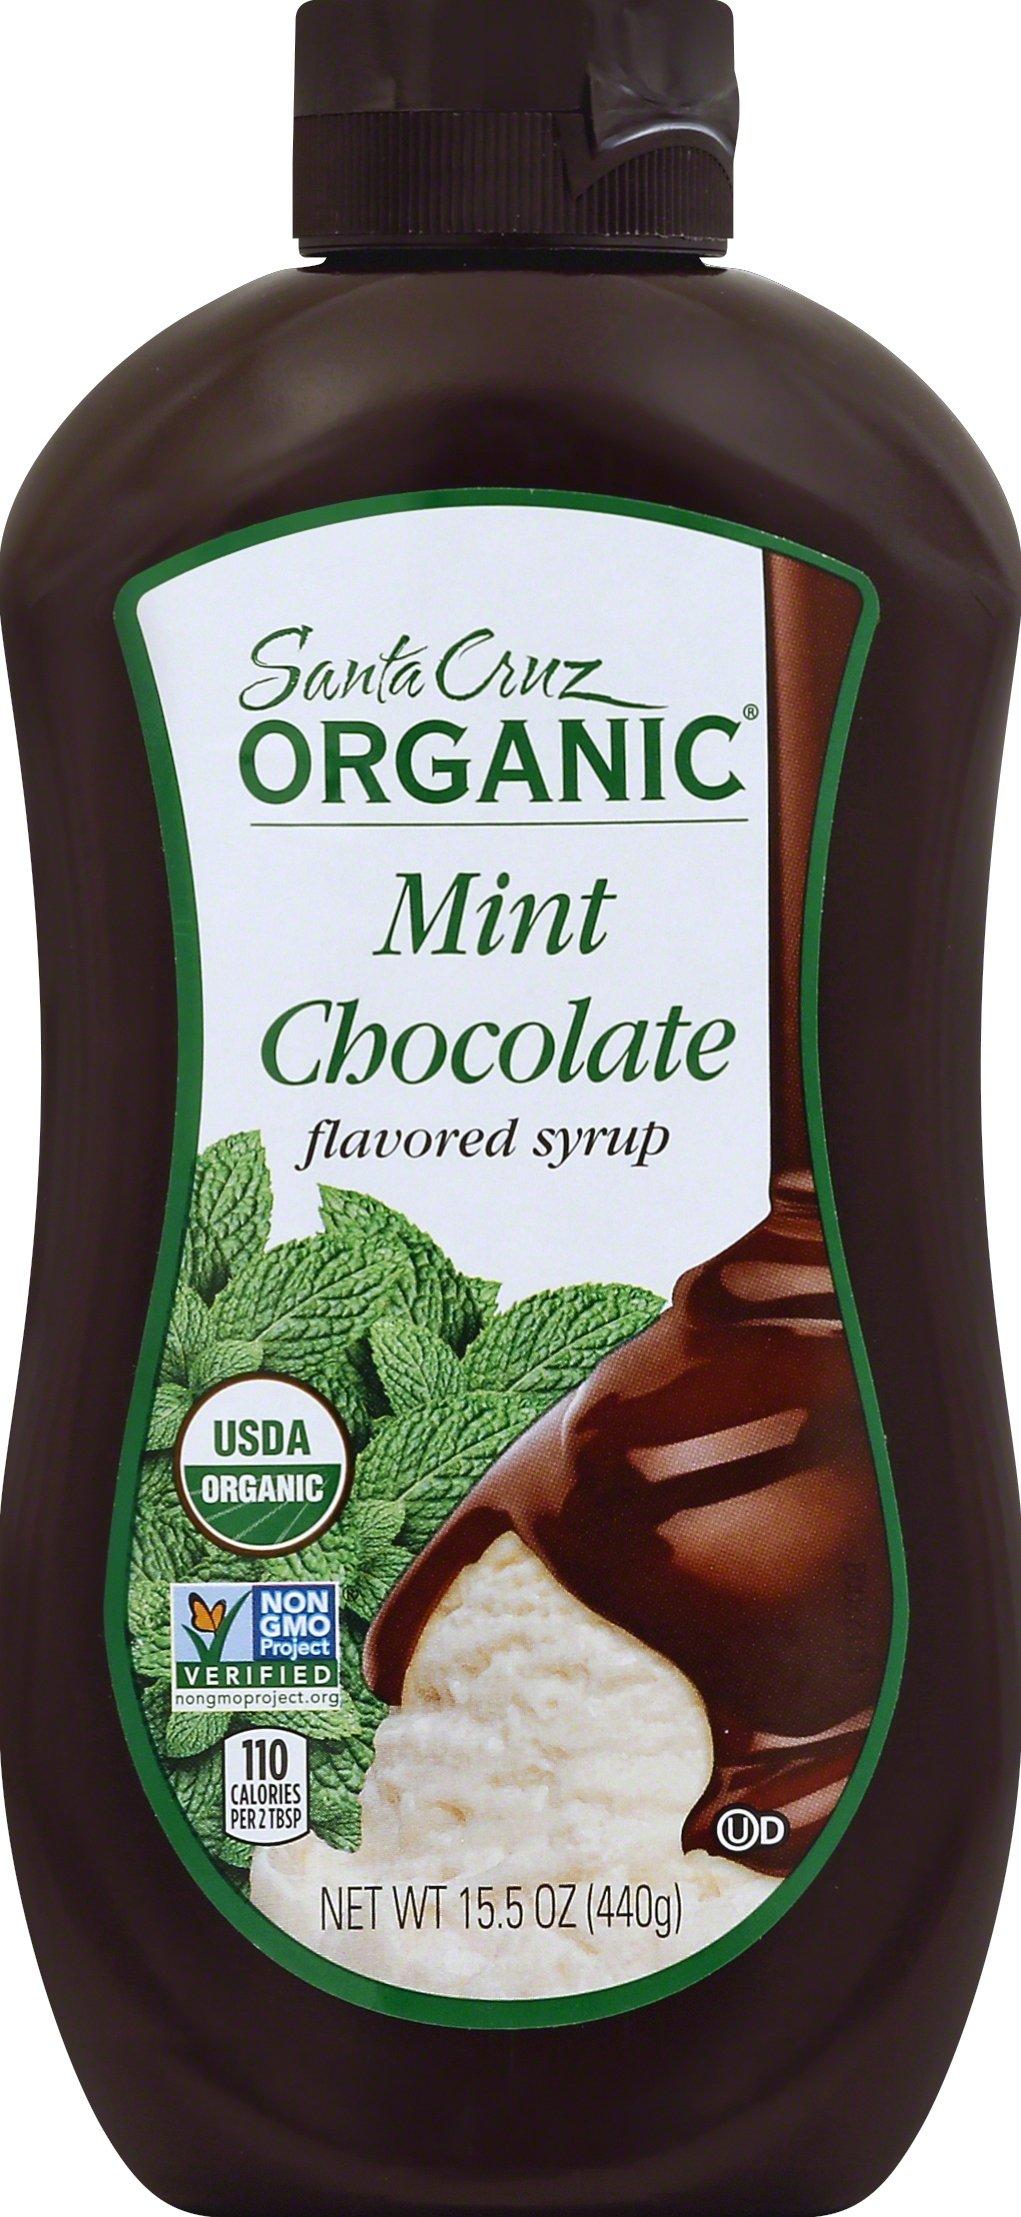 Santa Cruz Organics Mint Chocolate Syrup, 15.5 oz